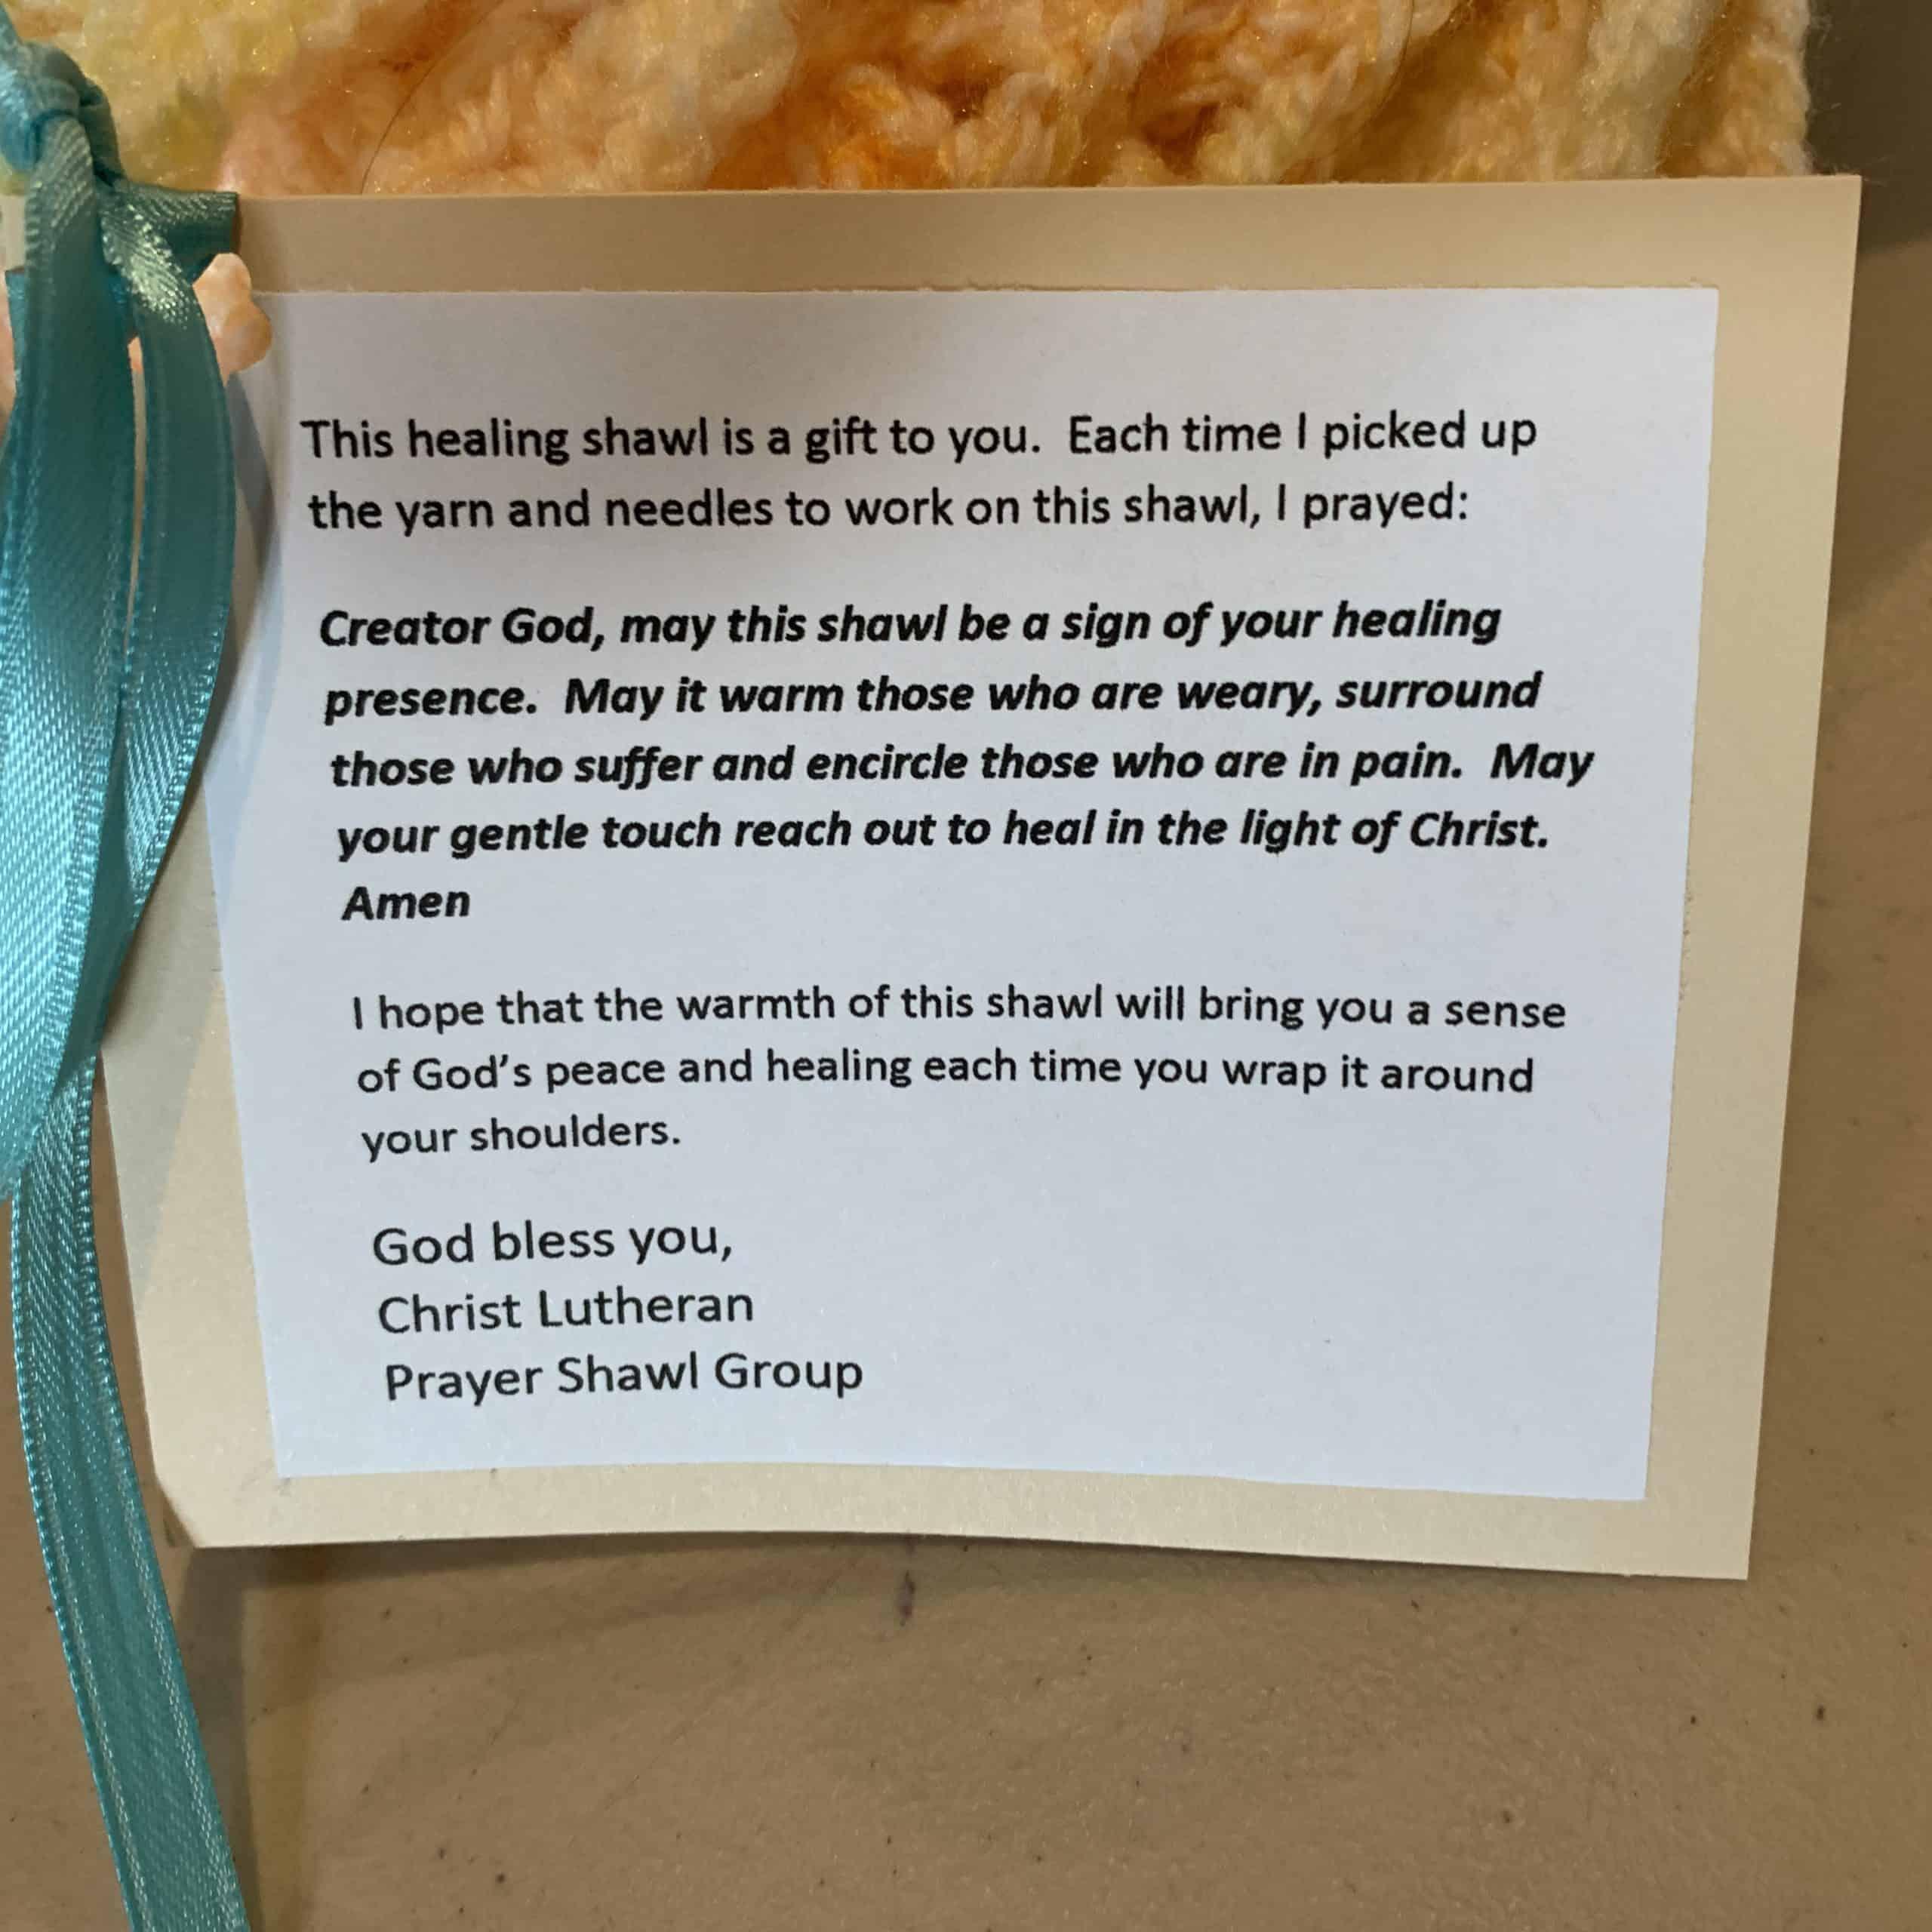 Christ Lutheran Church - Prayer Shawl - Note